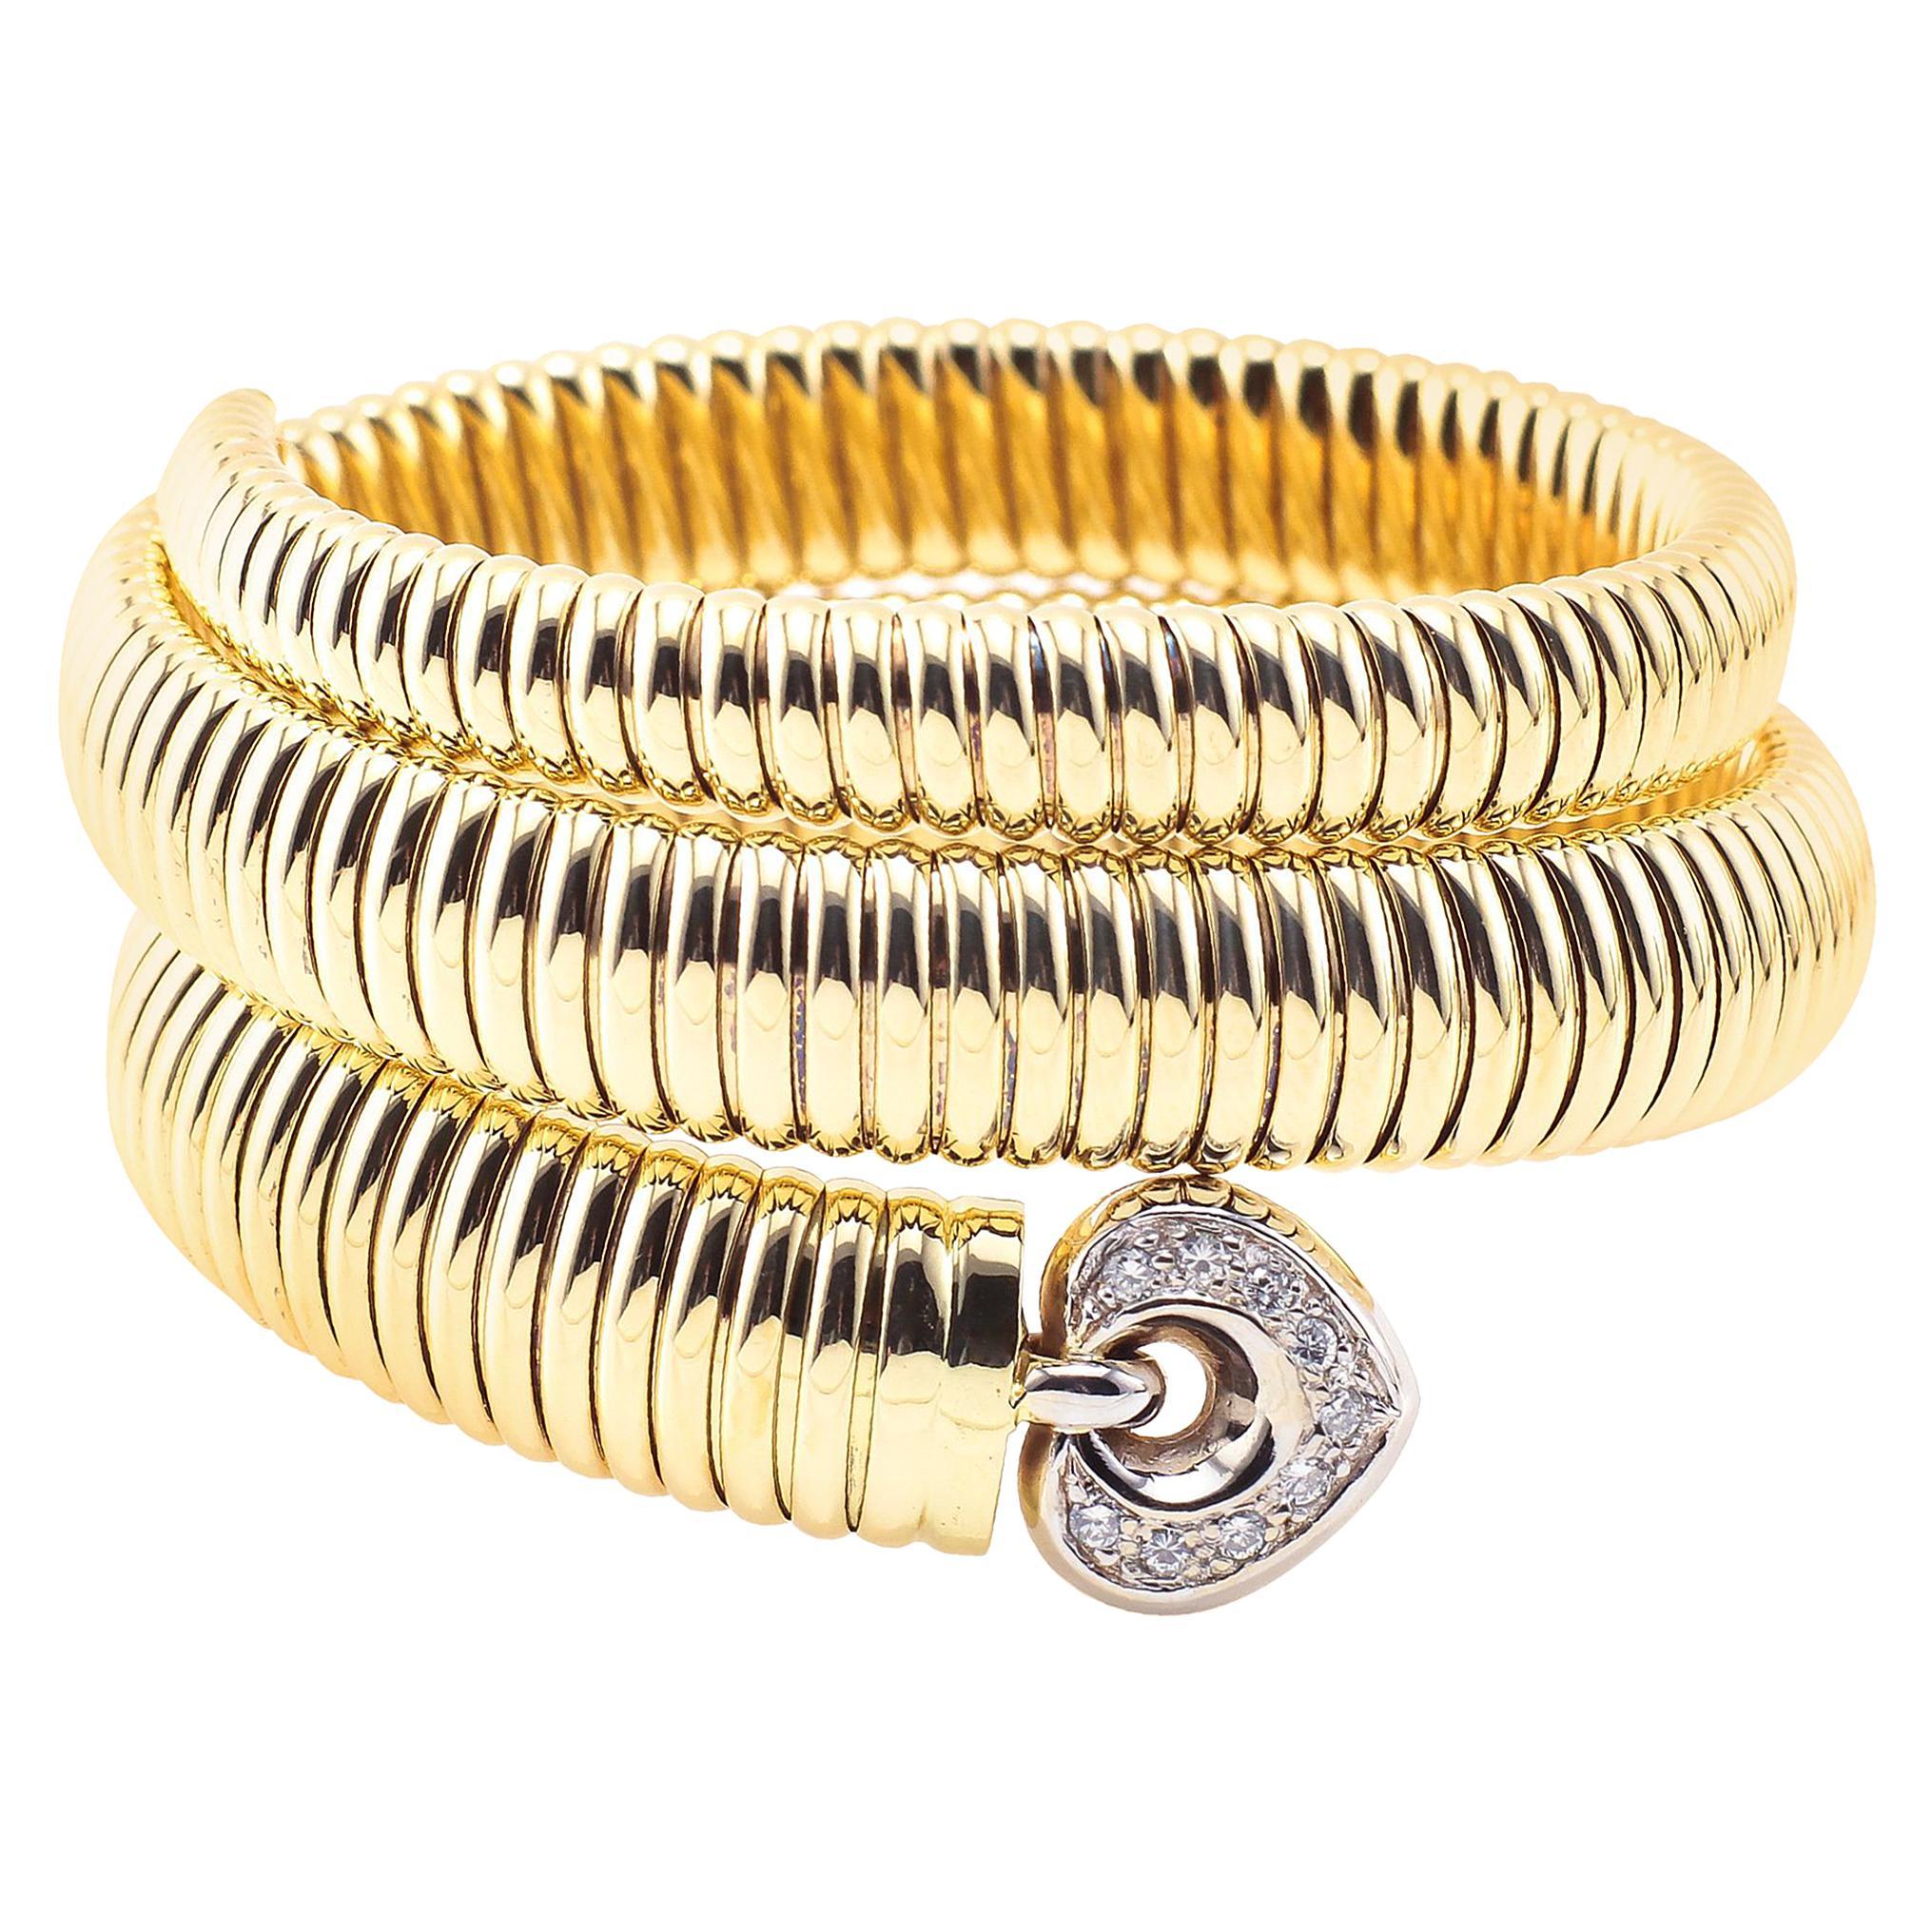 Coiled Snake 14 Karat Yellow Gold Bracelet with Diamonds